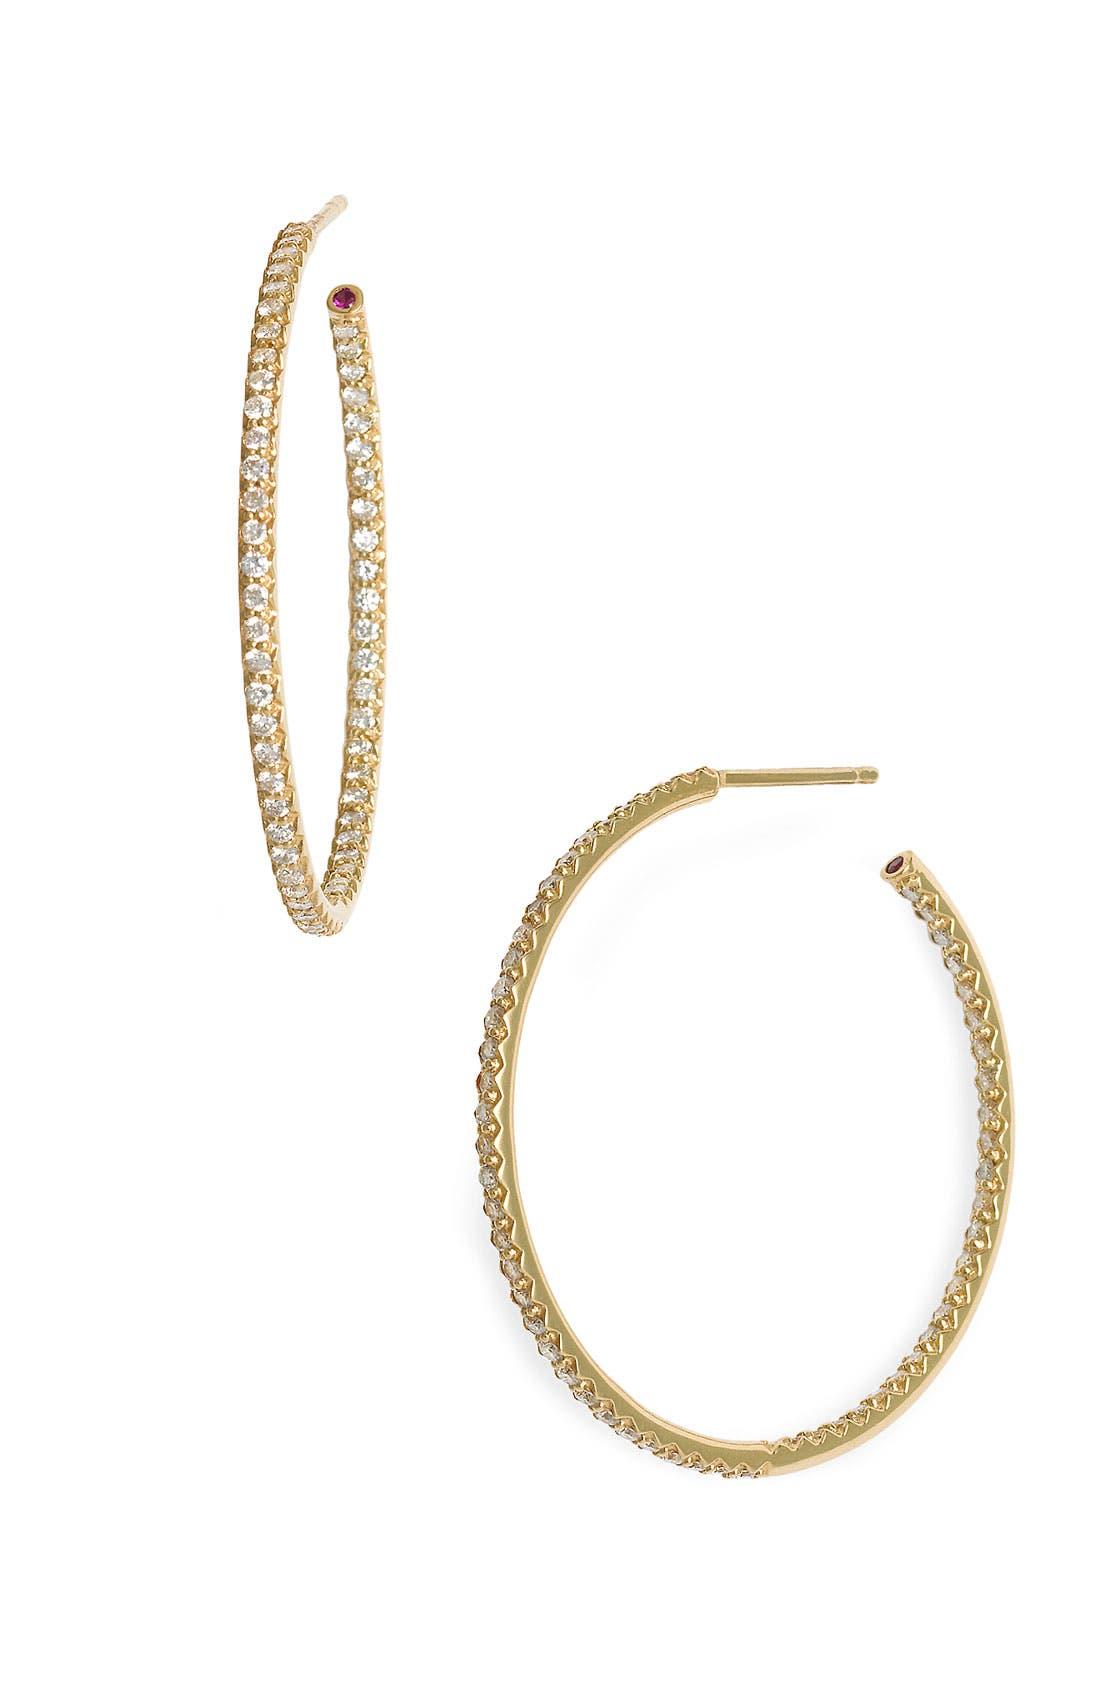 Main Image - Roberto Coin Inside Out Diamond Hoop Earrings